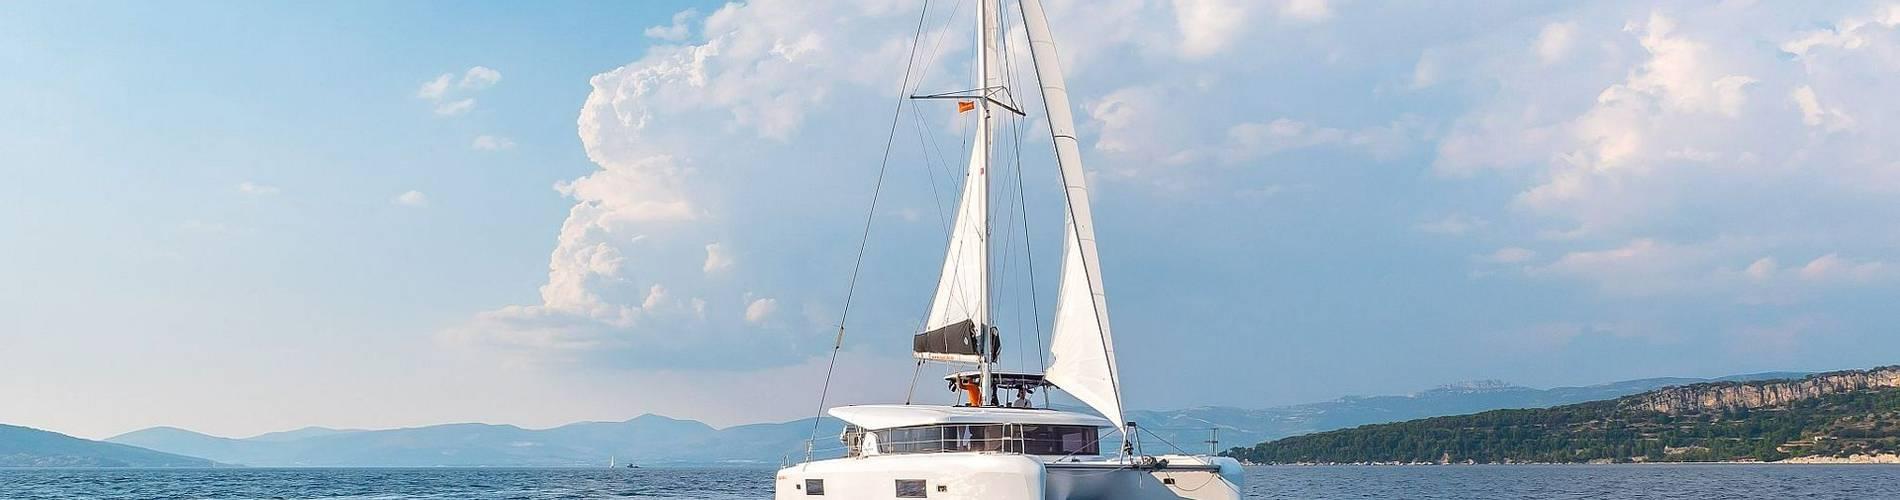 catamaran cruise 8.jpg